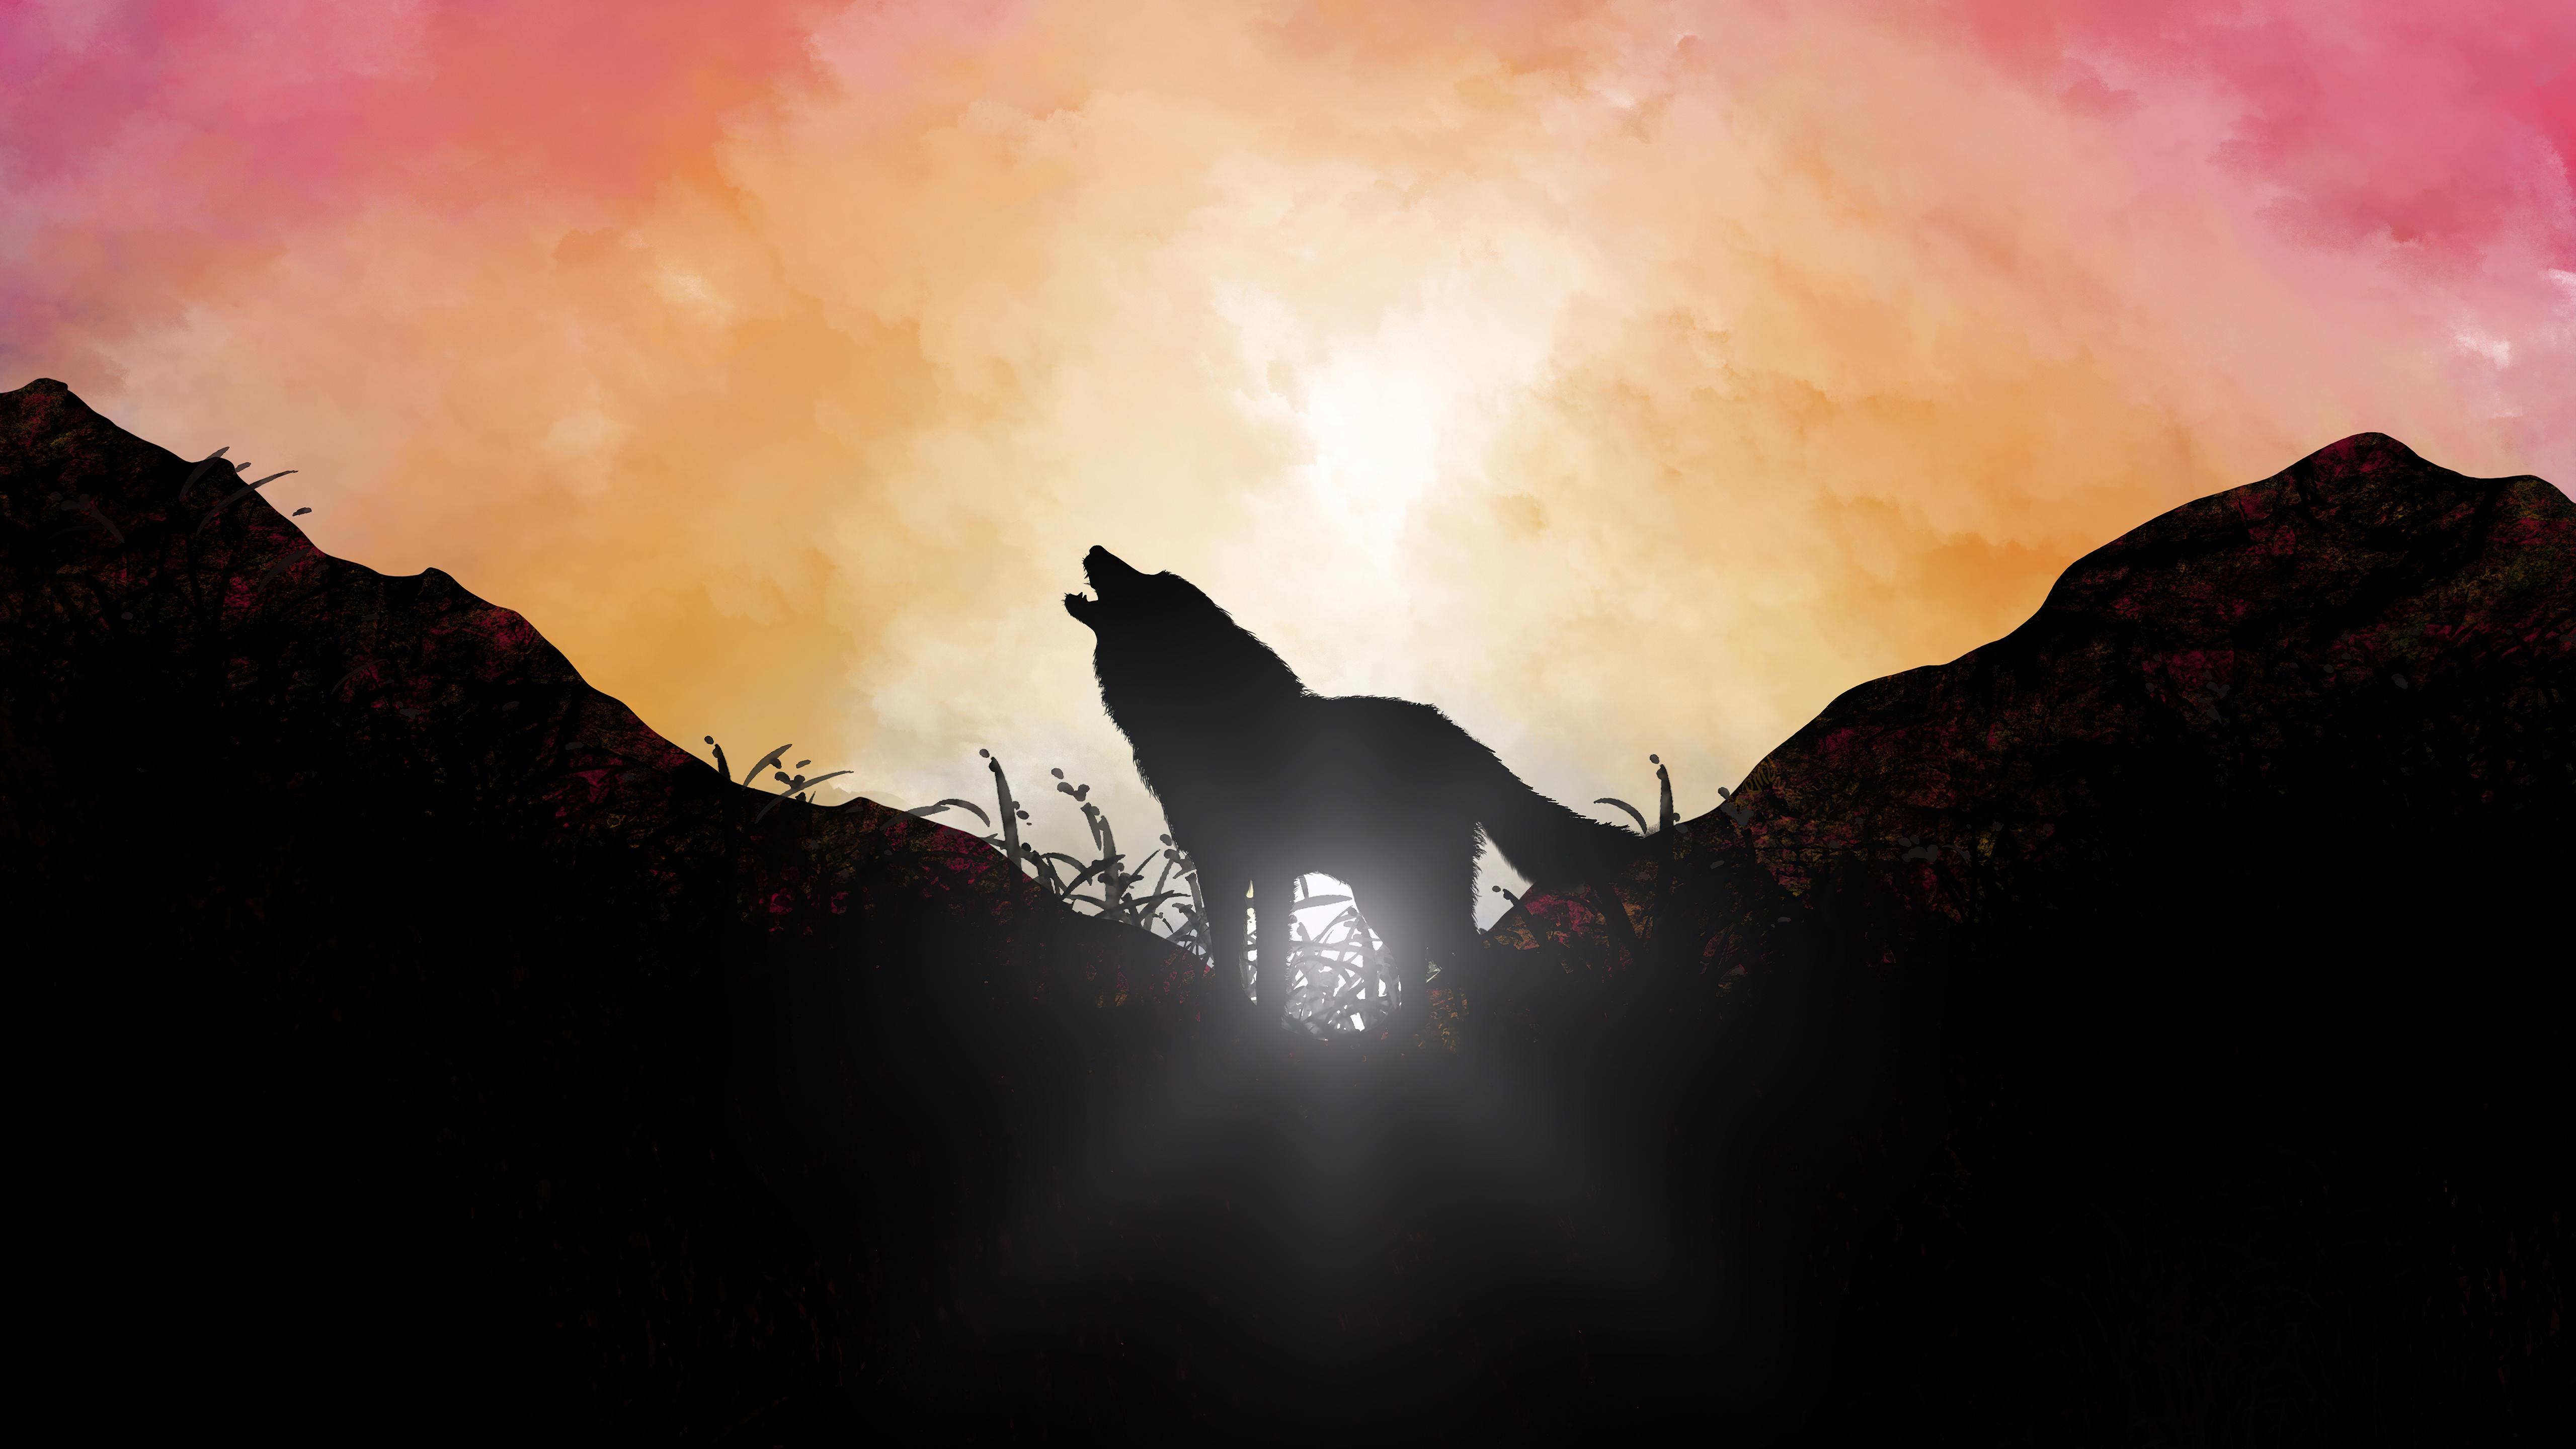 fox howling sunrise 4k 1618131120 - Fox Howling Sunrise 4k - Fox Howling Sunrise 4k wallpapers